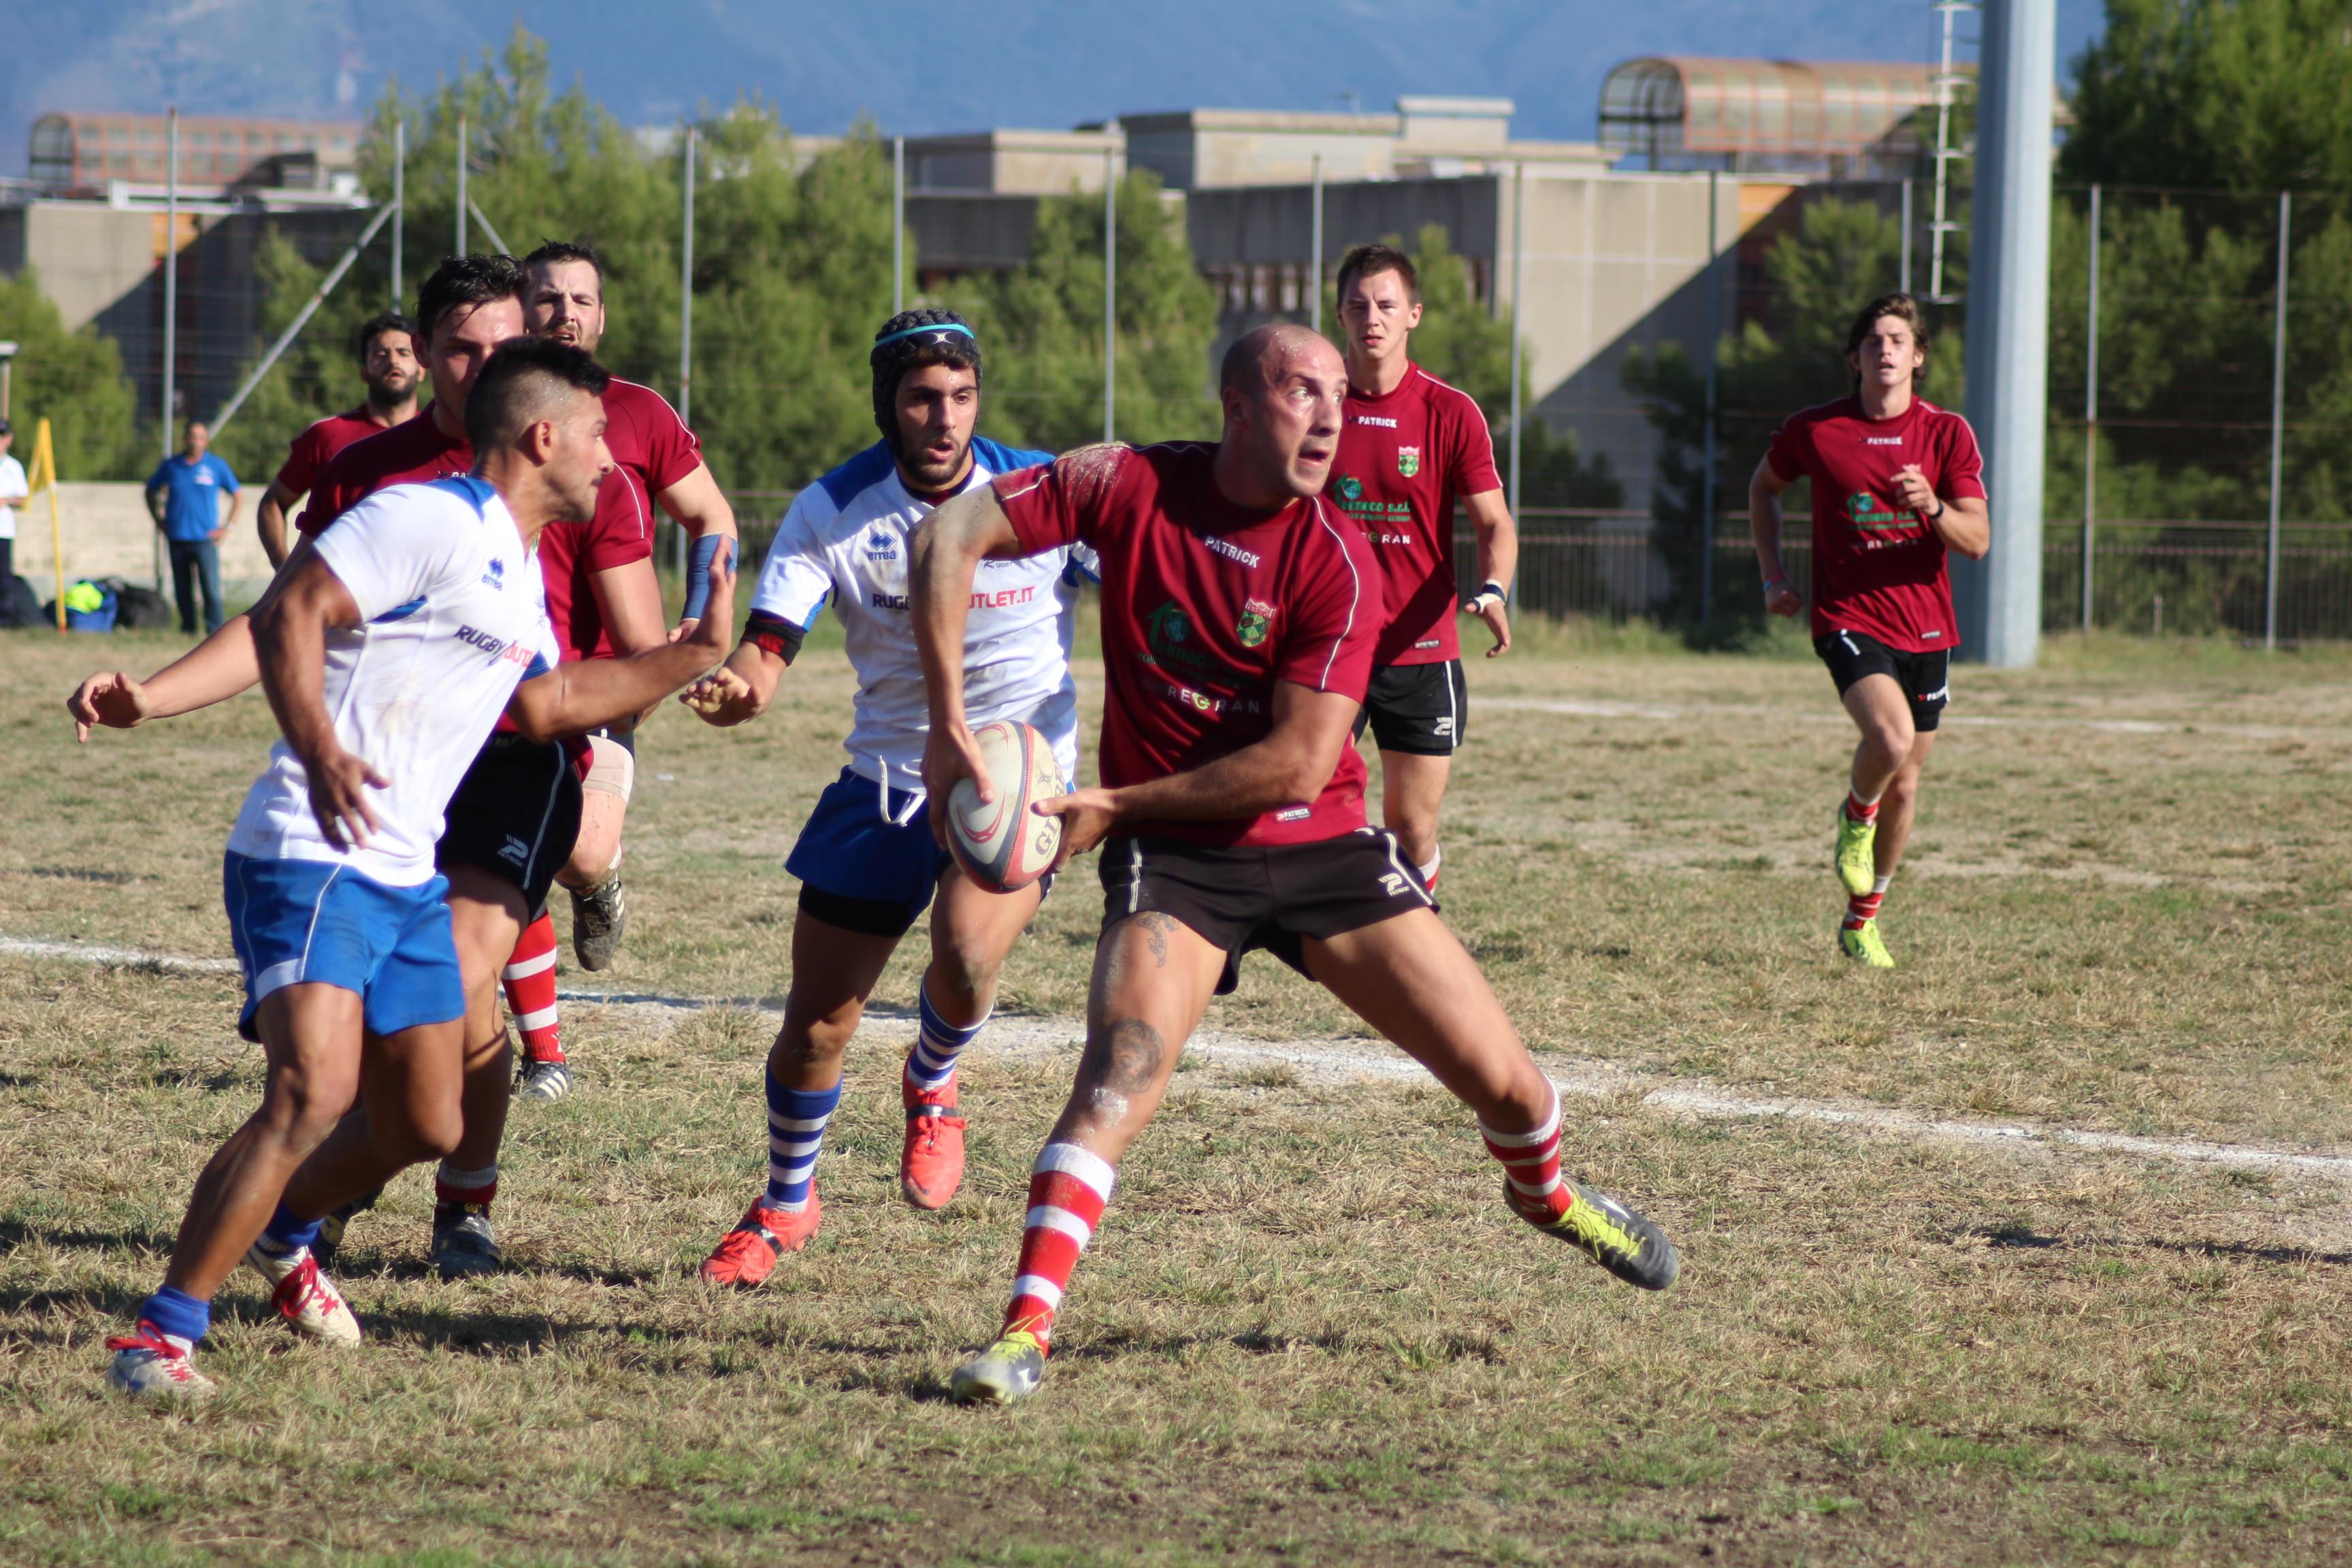 Amatori Messina - Padua Ragusa 10-10-14 (1)